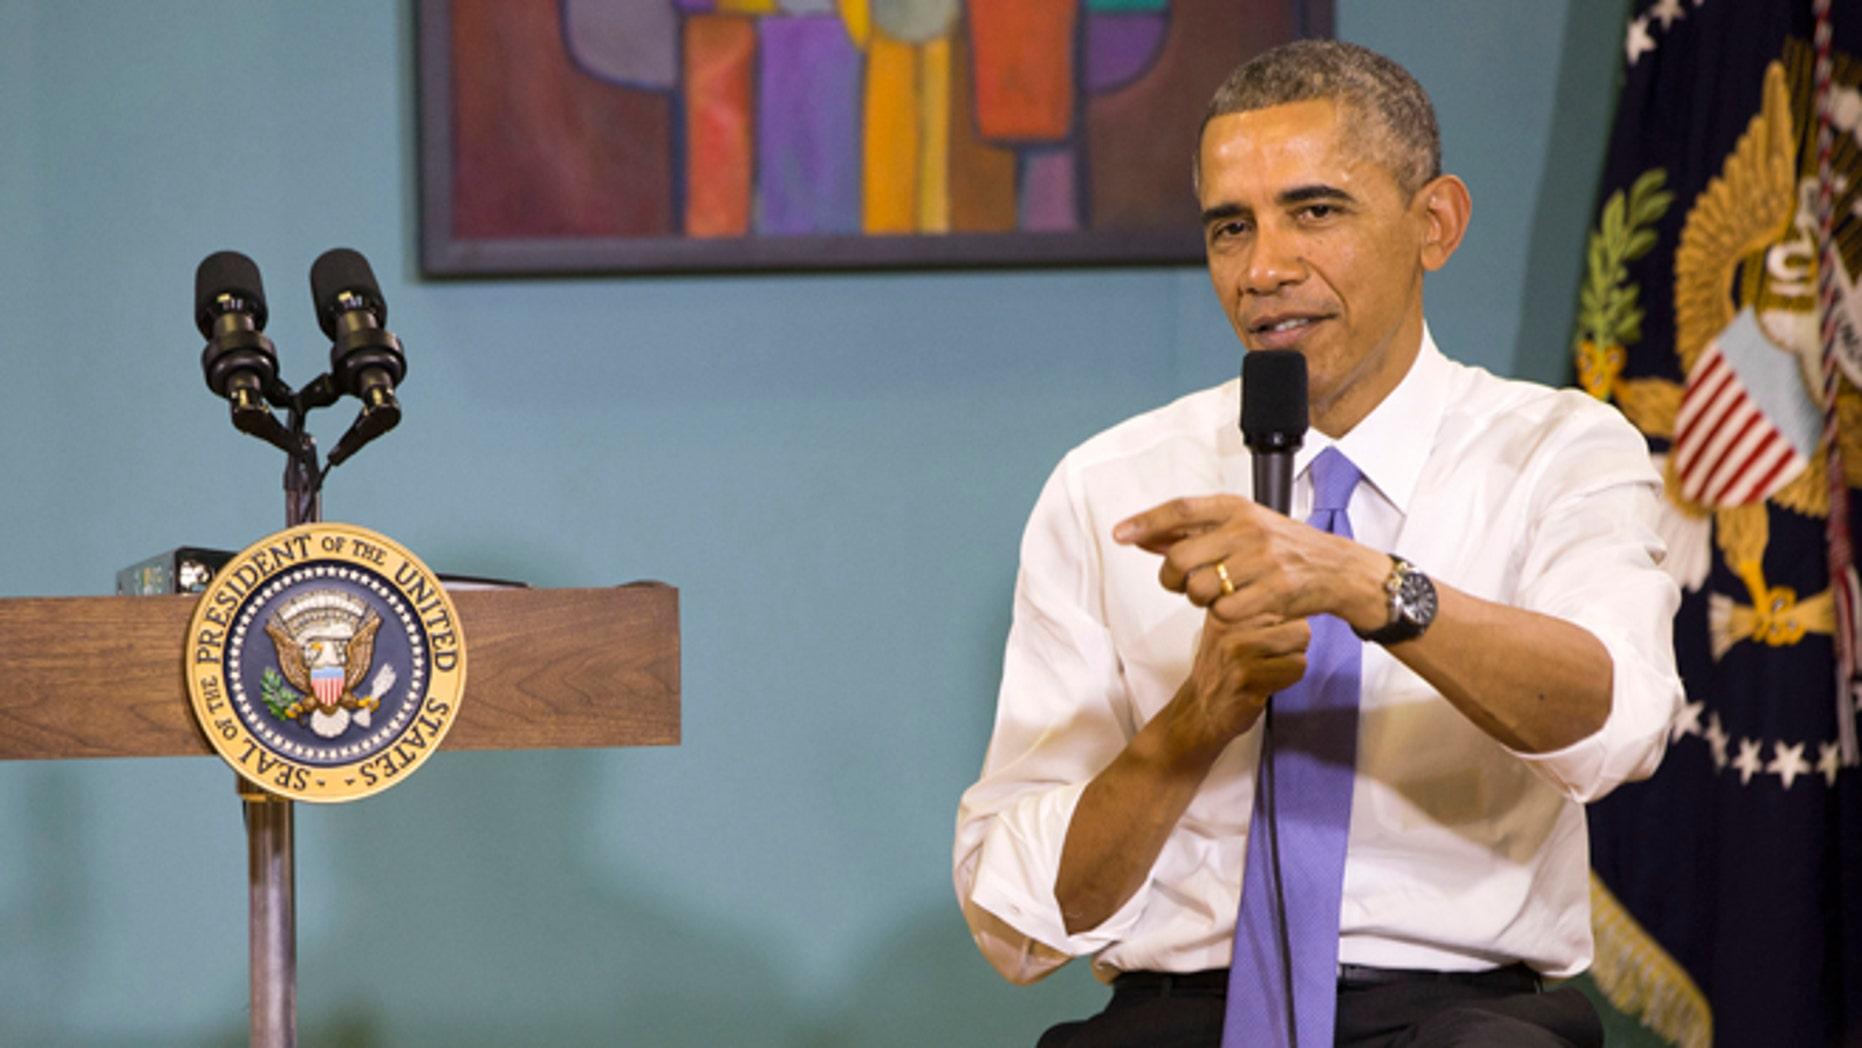 This Tuesday, Dec. 9, 2014 photo shows, President Barack Obama immigration town hall at Casa Azafran in Nashville, Tenn.